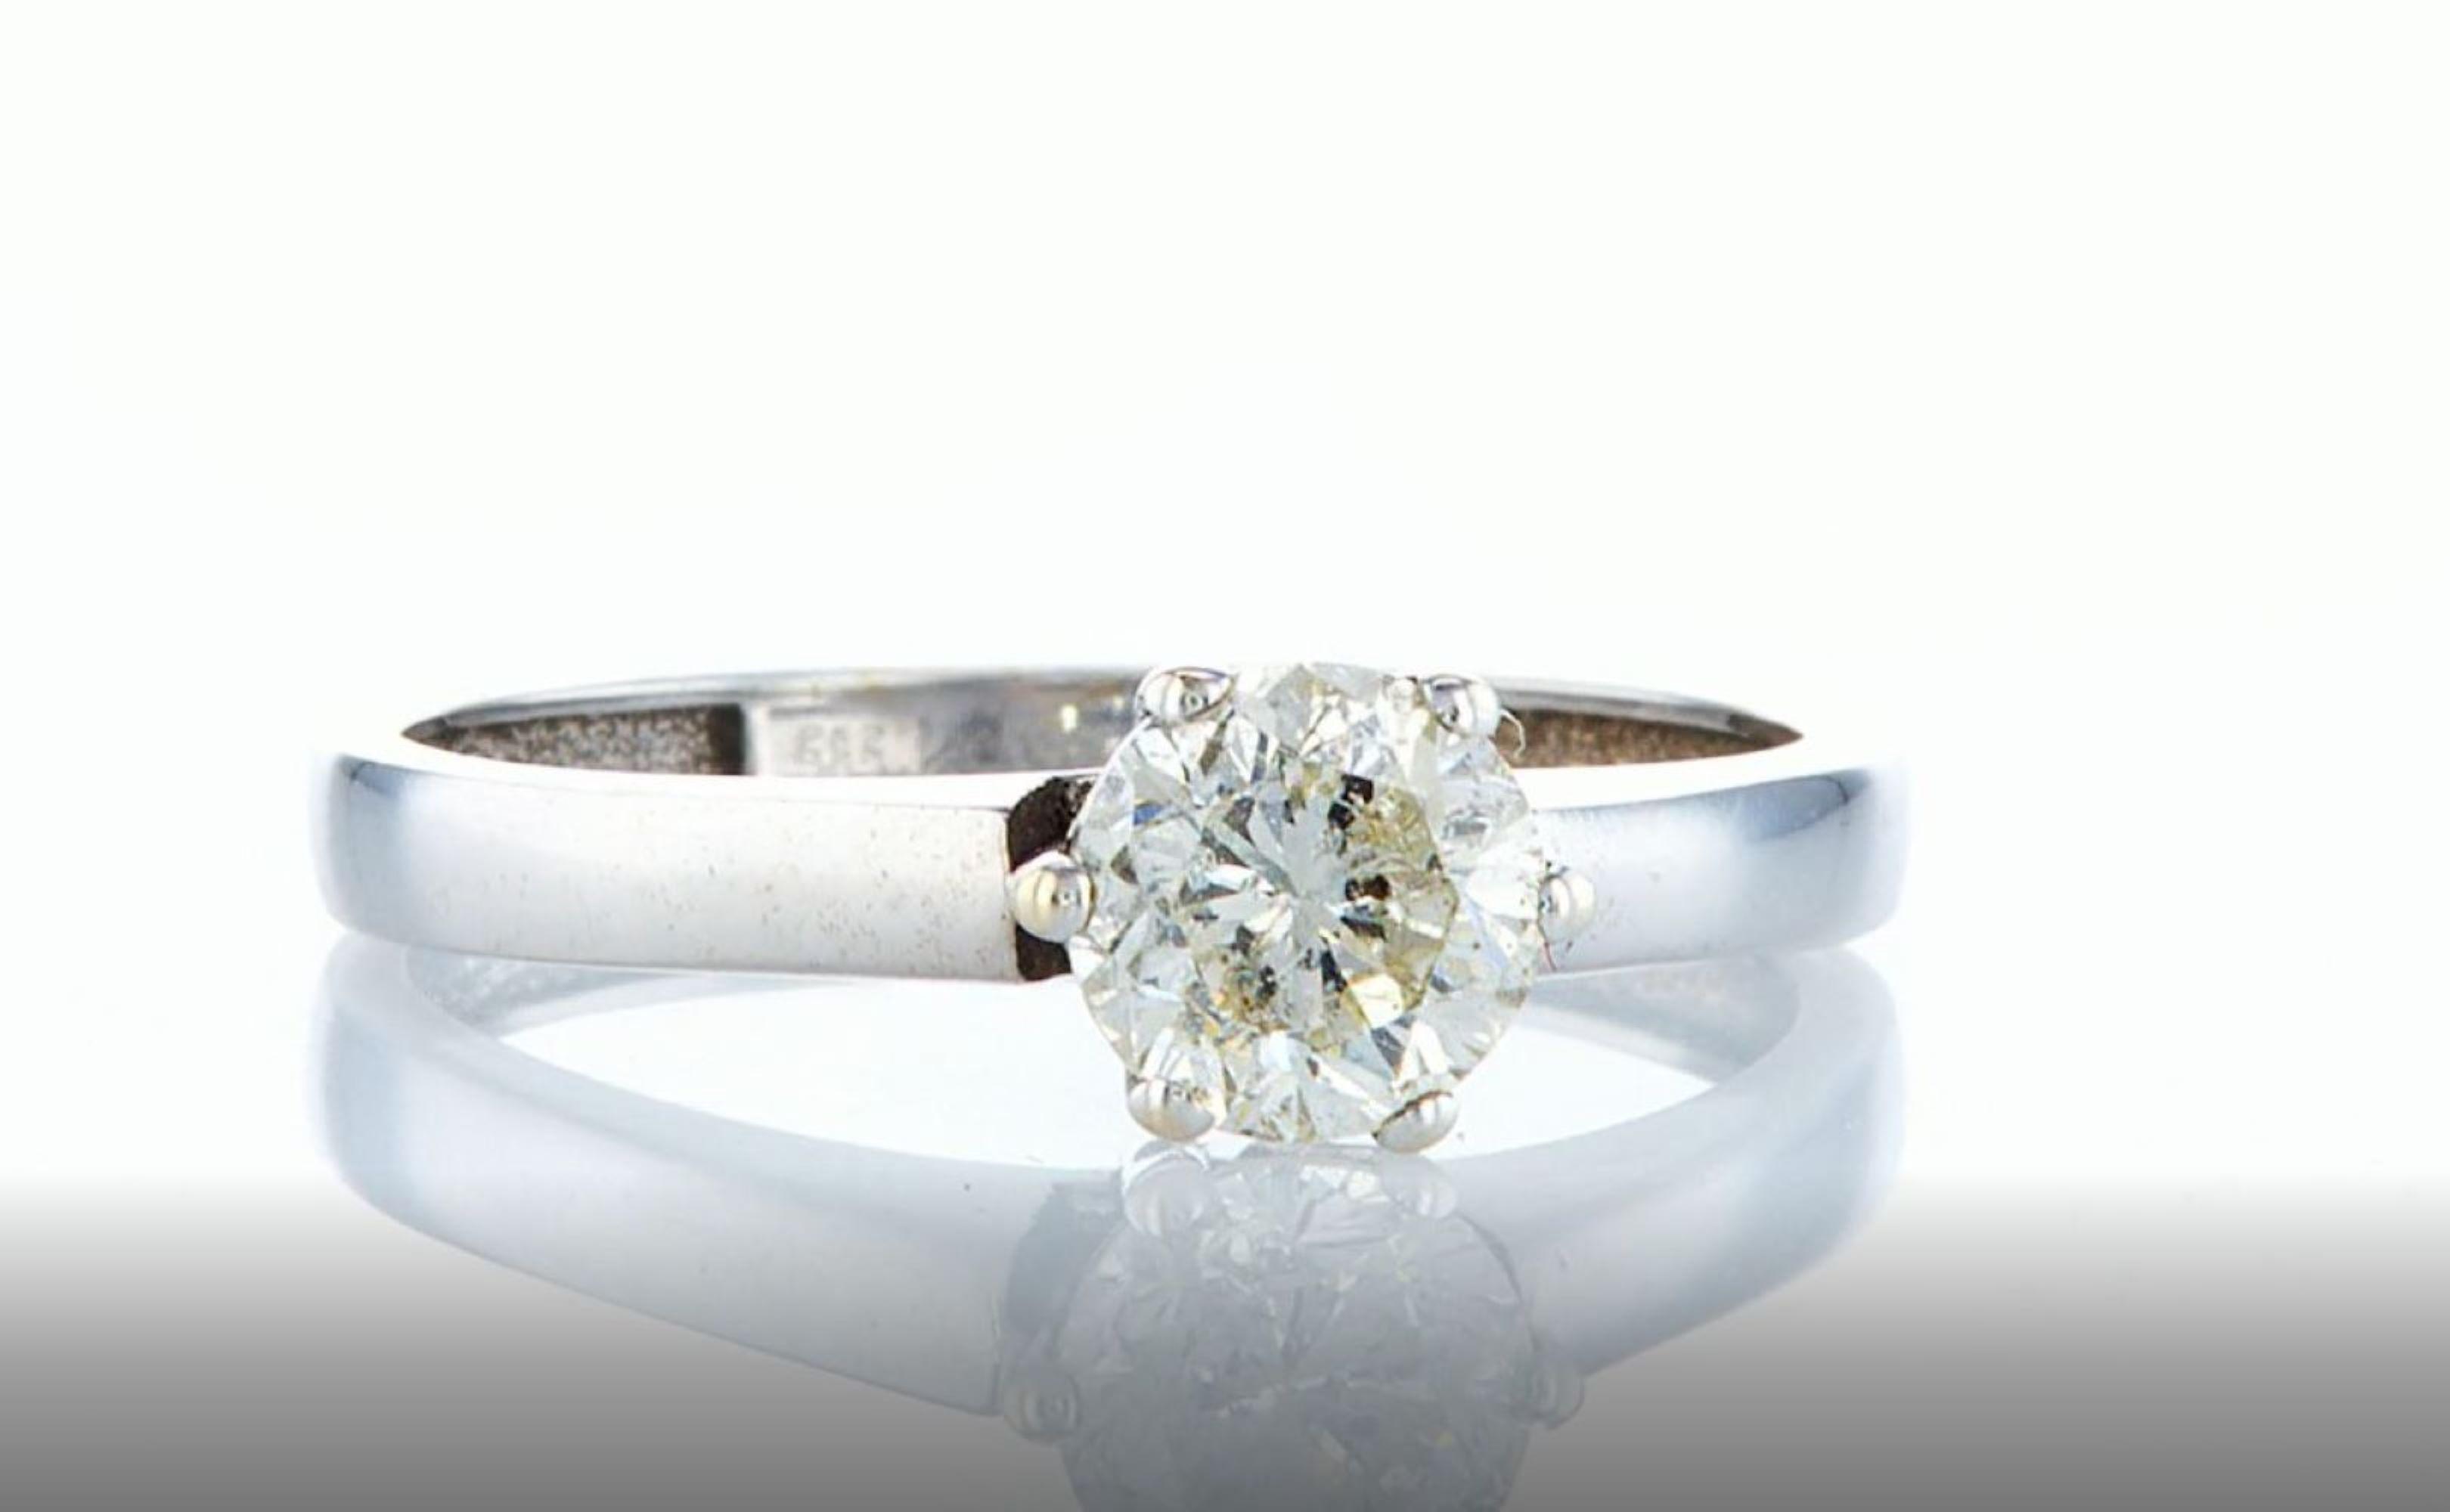 14K White gold ring 1.05CTW - Image 6 of 7